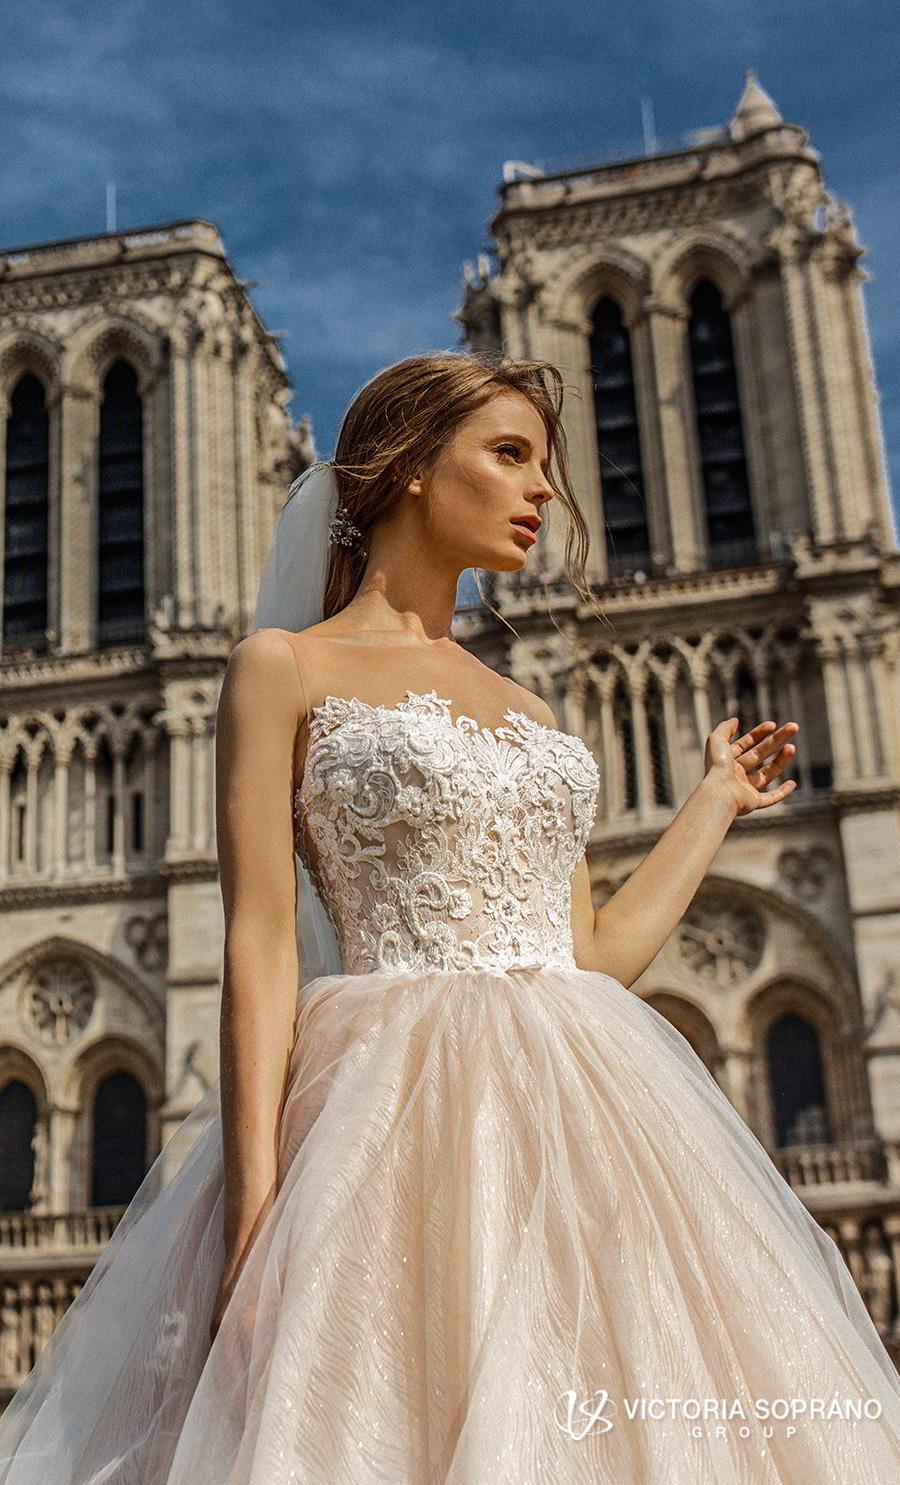 victoria soprano 2019 bridal detachable long sleeves off the shoulder illusion bateau sweetheart neckline princess blush ball gown wedding dress chapel train (justina) zv